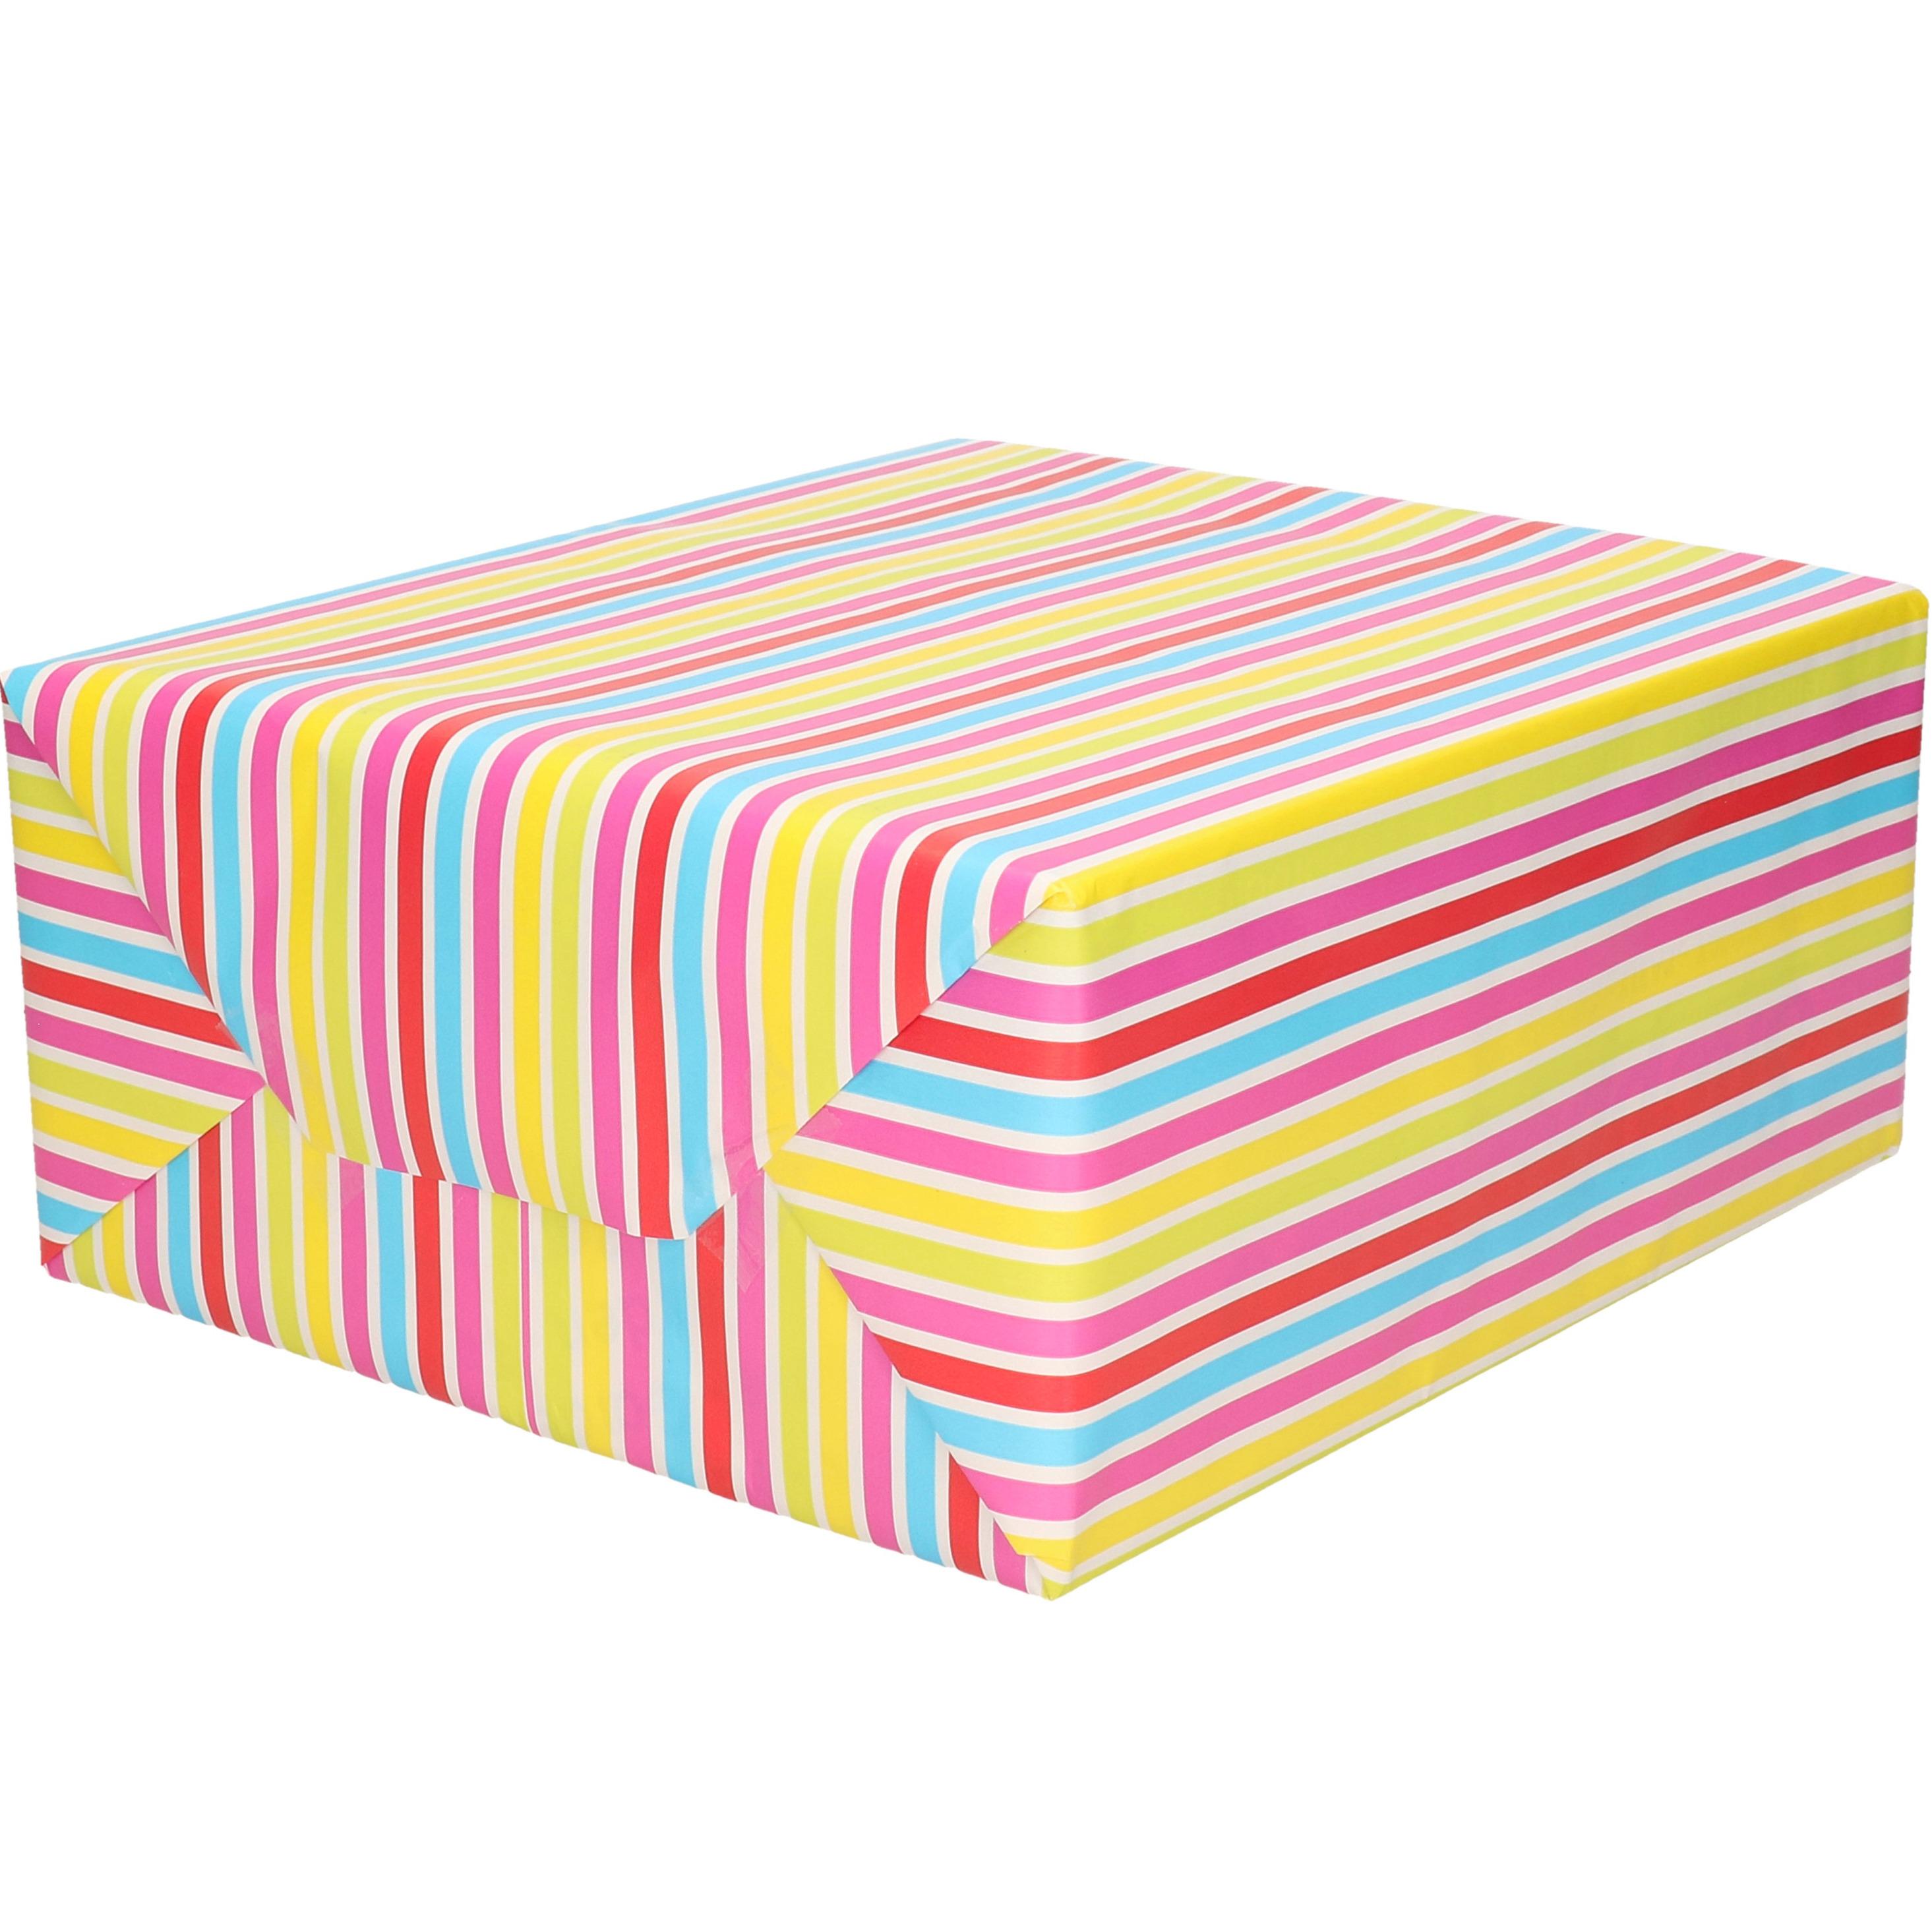 1x Rol Inpakpapier/cadeaupapier gekleurde streepjes design 200 x 70 cm